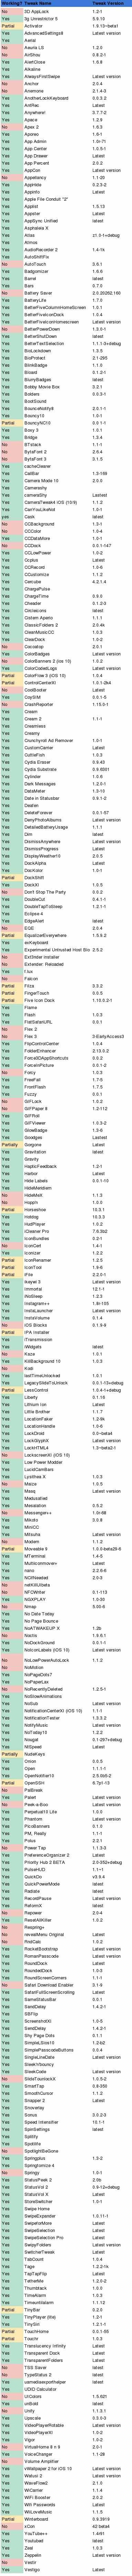 List: iOS 10 3 3 Jailbreak Tweaks Compatibility For 64-Bit